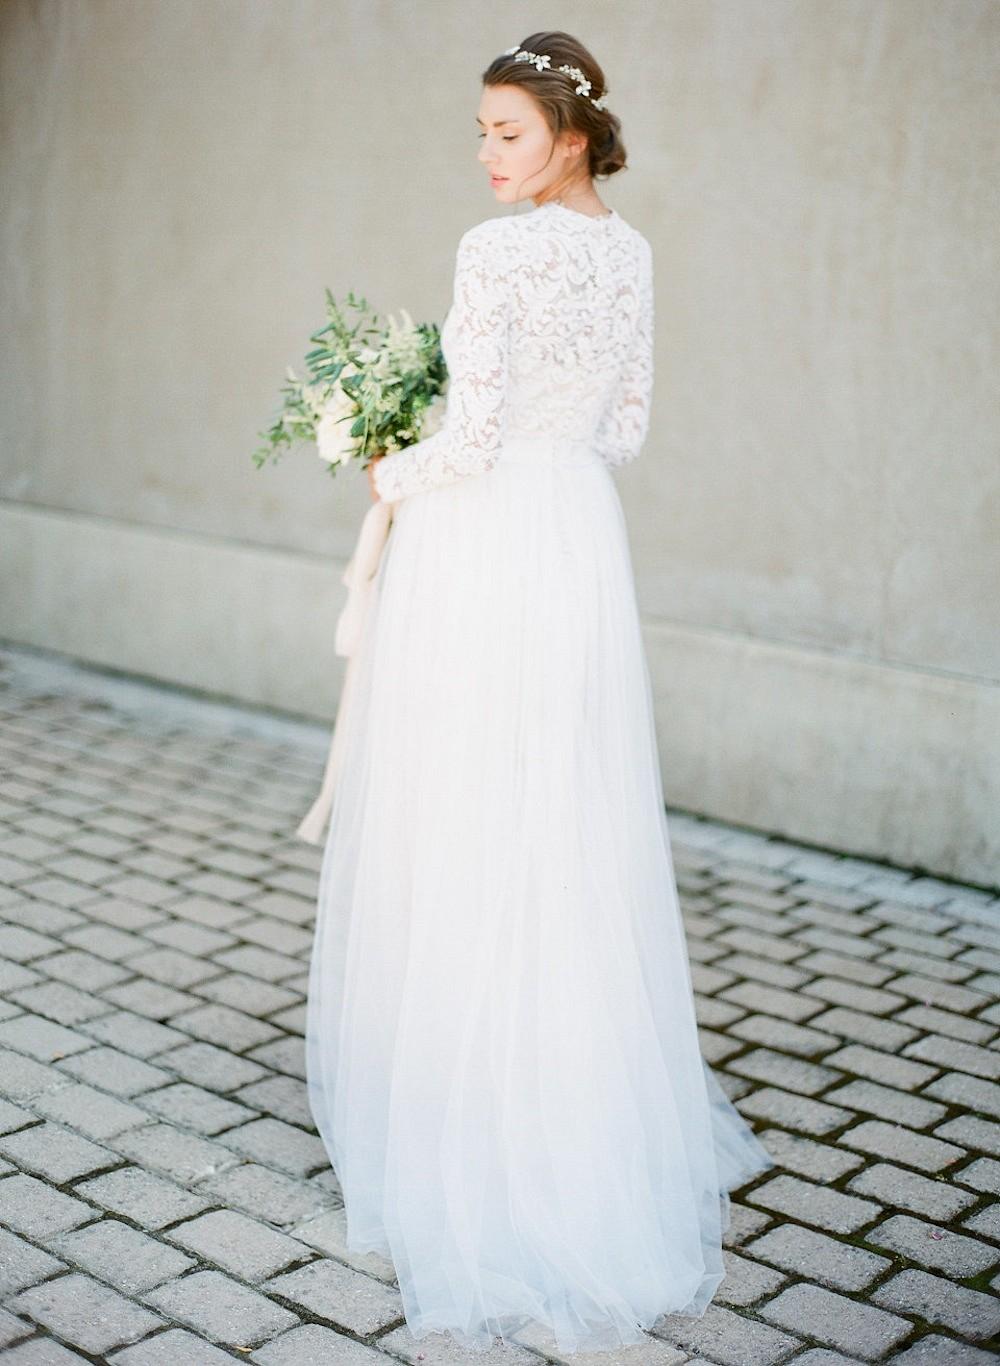 Rustic Estate Wedding Inspiration in Greece